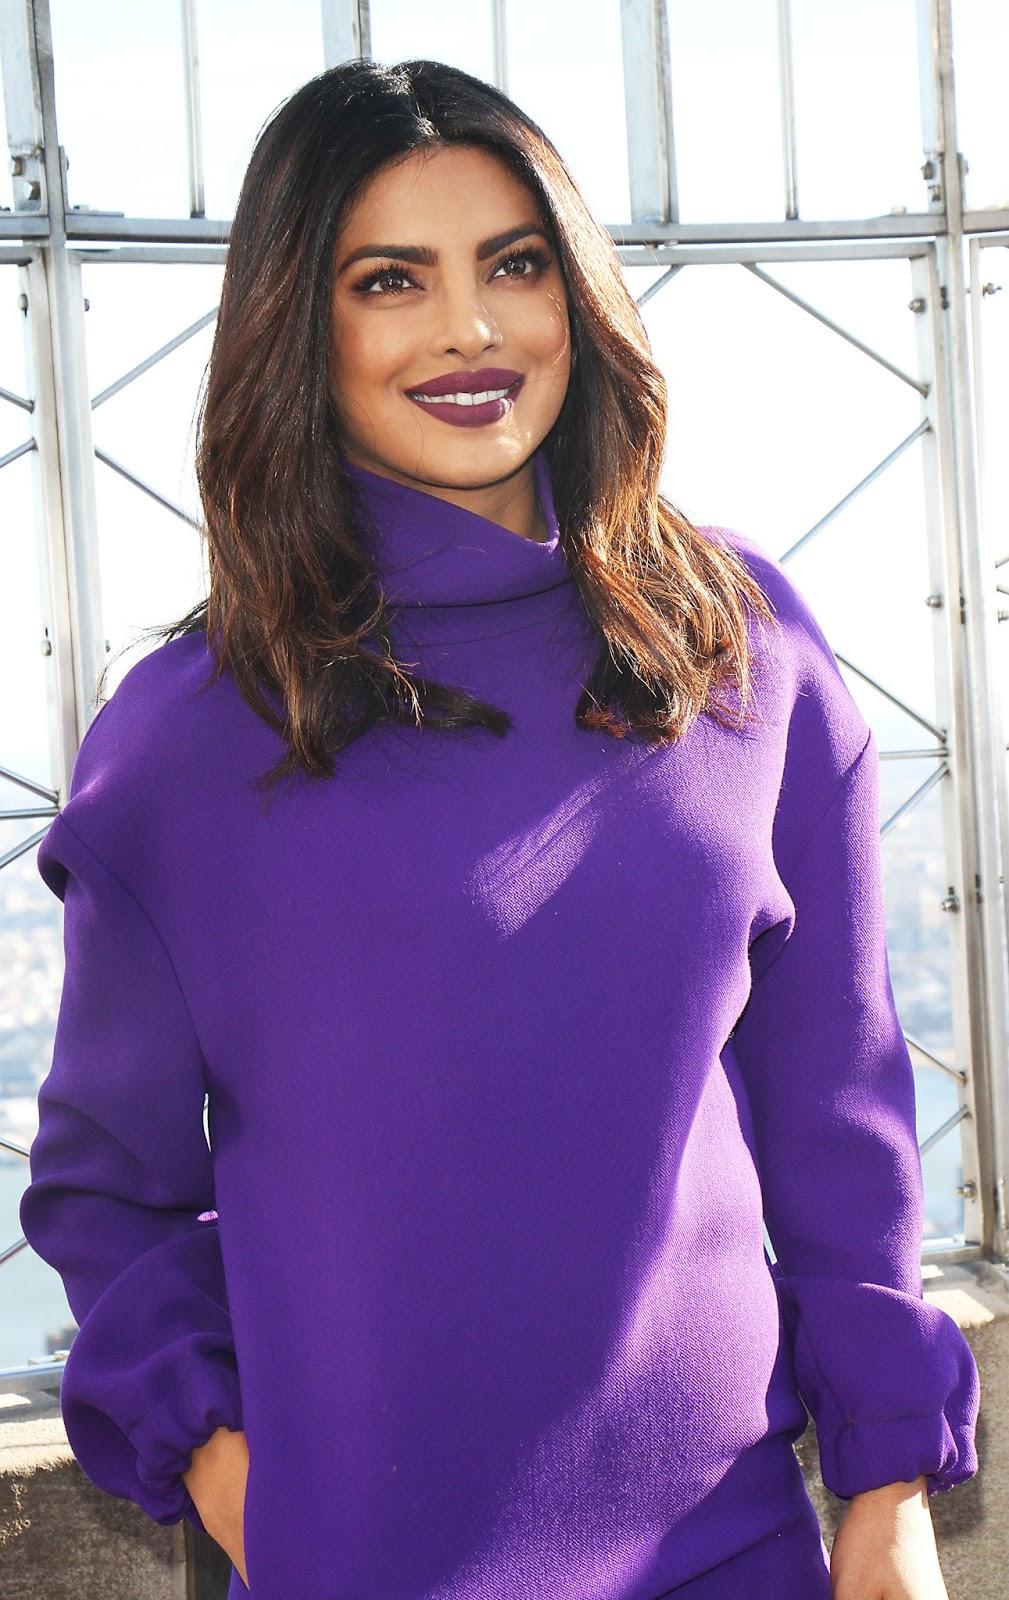 Priyanka Chopra Looks Sexy In a Purple Short Dress and ...